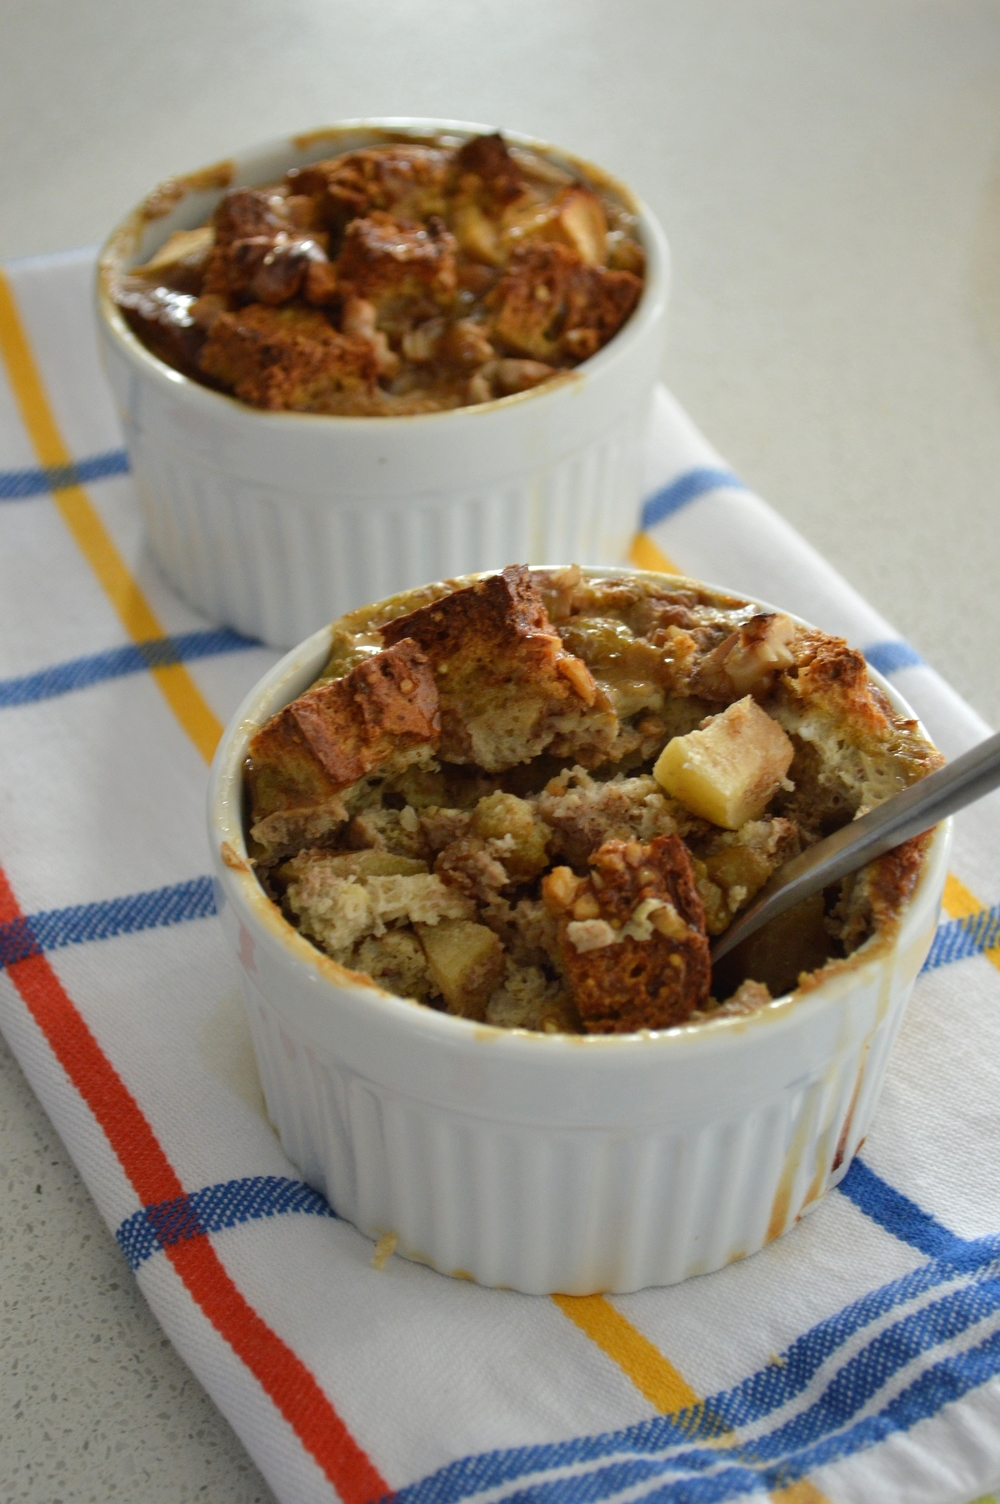 LaurenSchwaiger-Blog-Apple-Walnut-Bread-Pudding.jpg